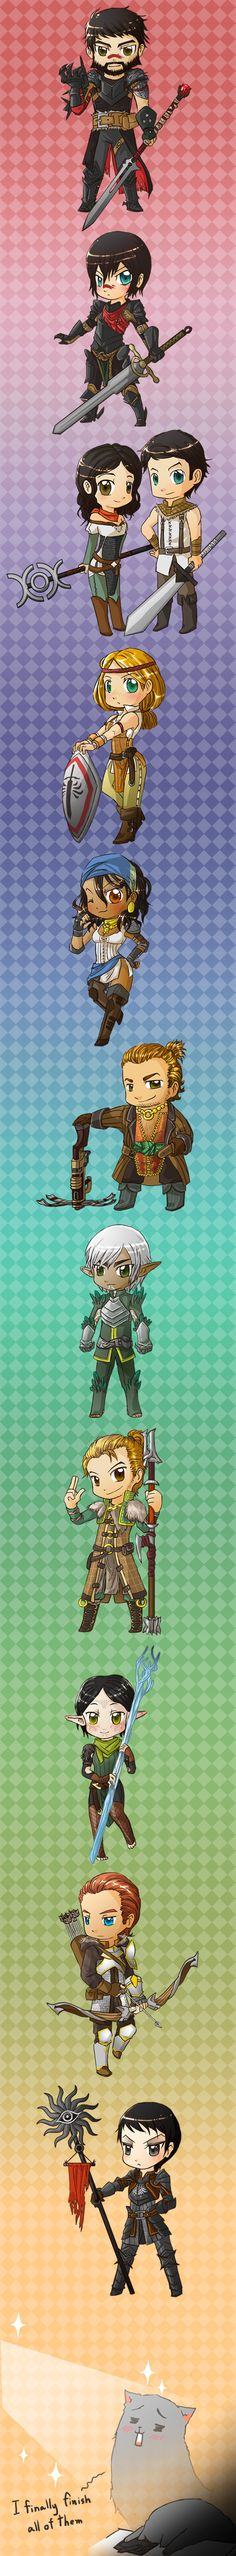 DA2 chibi character line up by spidercandy.deviantart.com on @deviantART